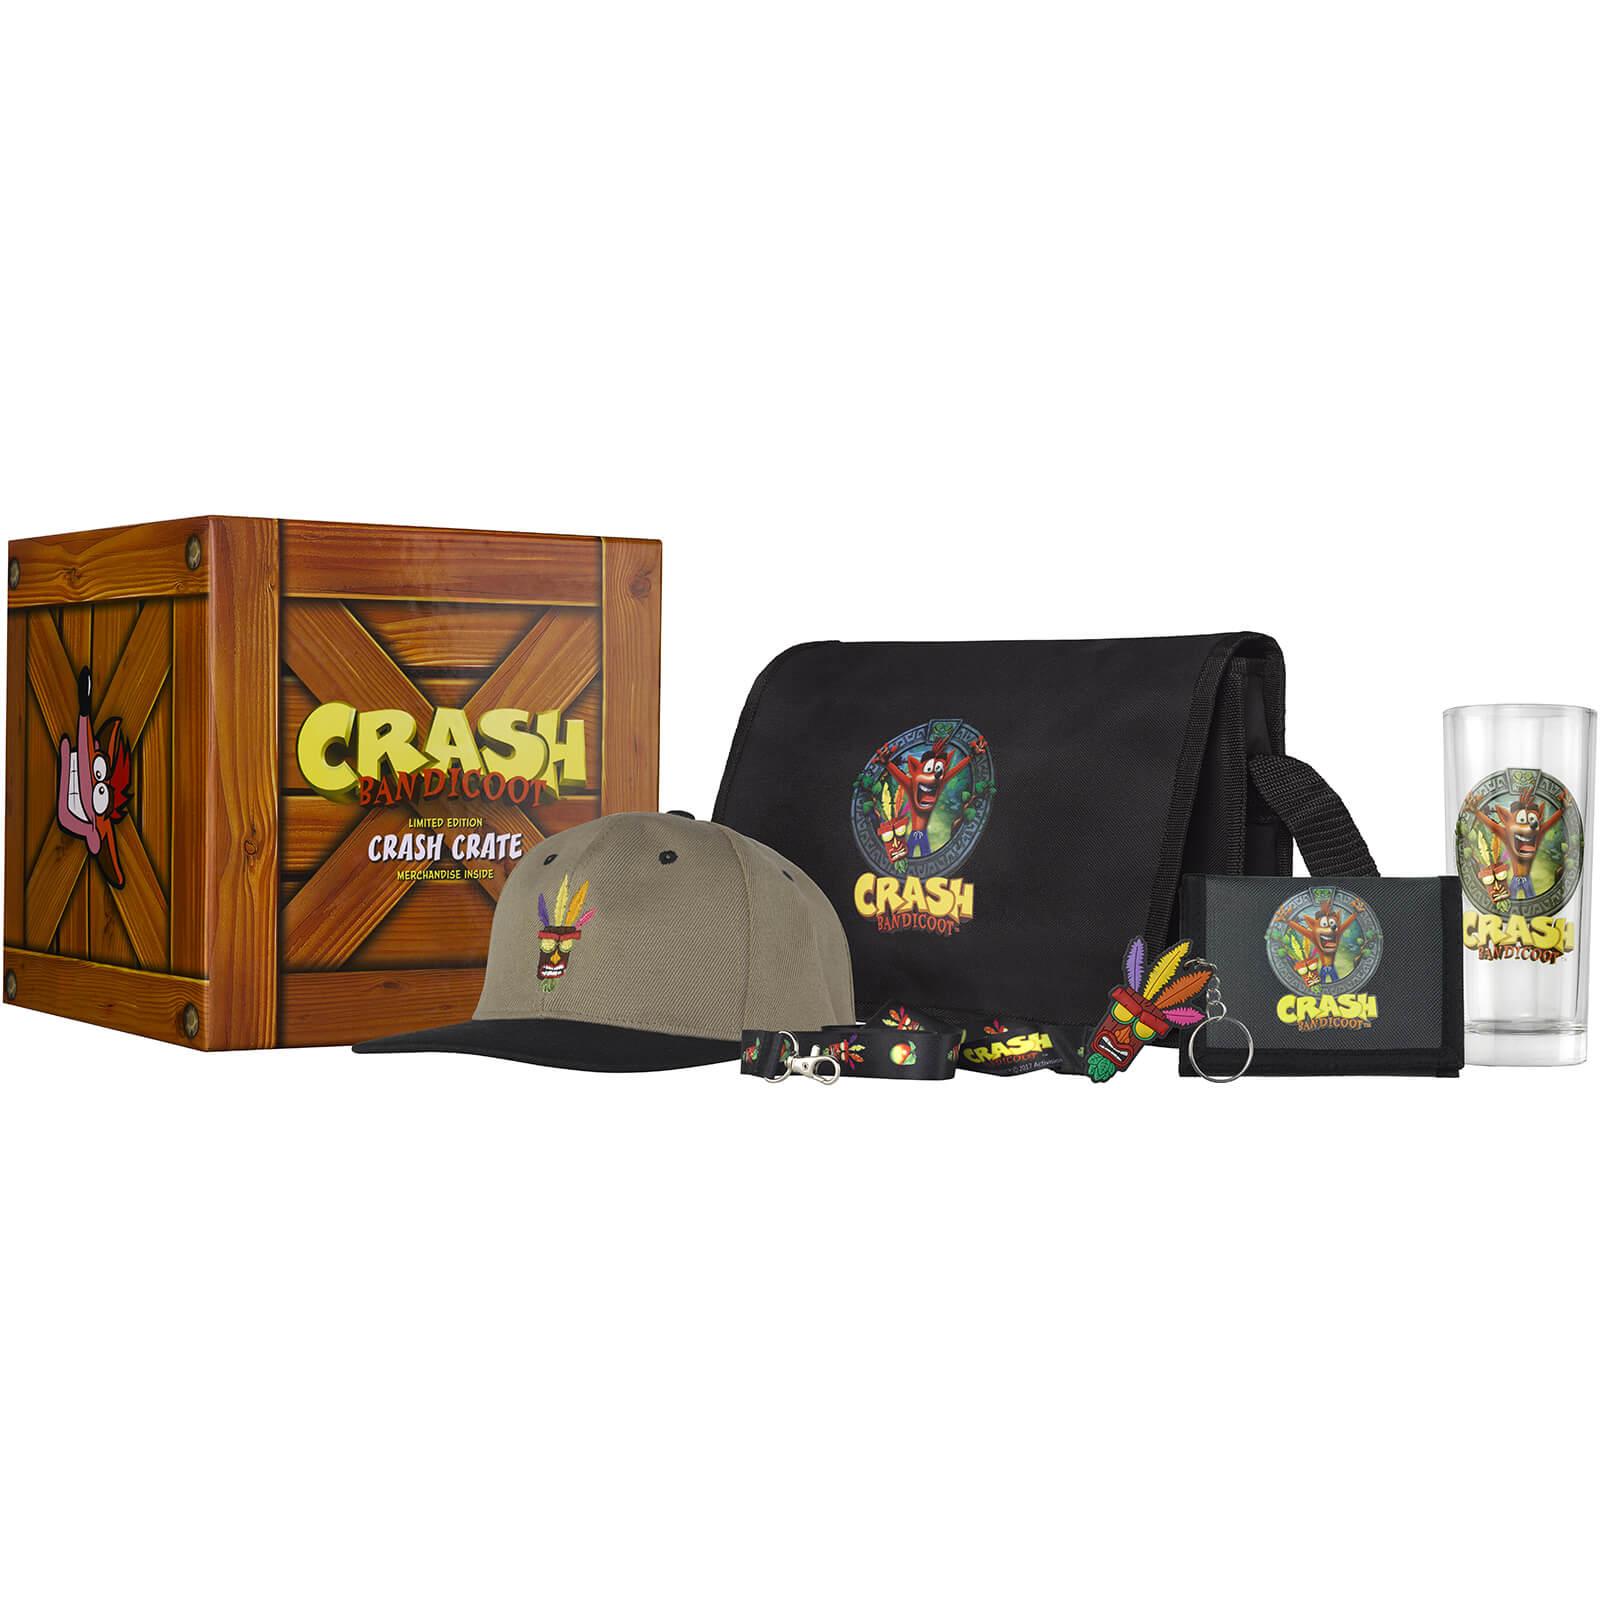 Skrzynia gadżetów Crash Bandicoot Collectable Big Box @ Zavvi